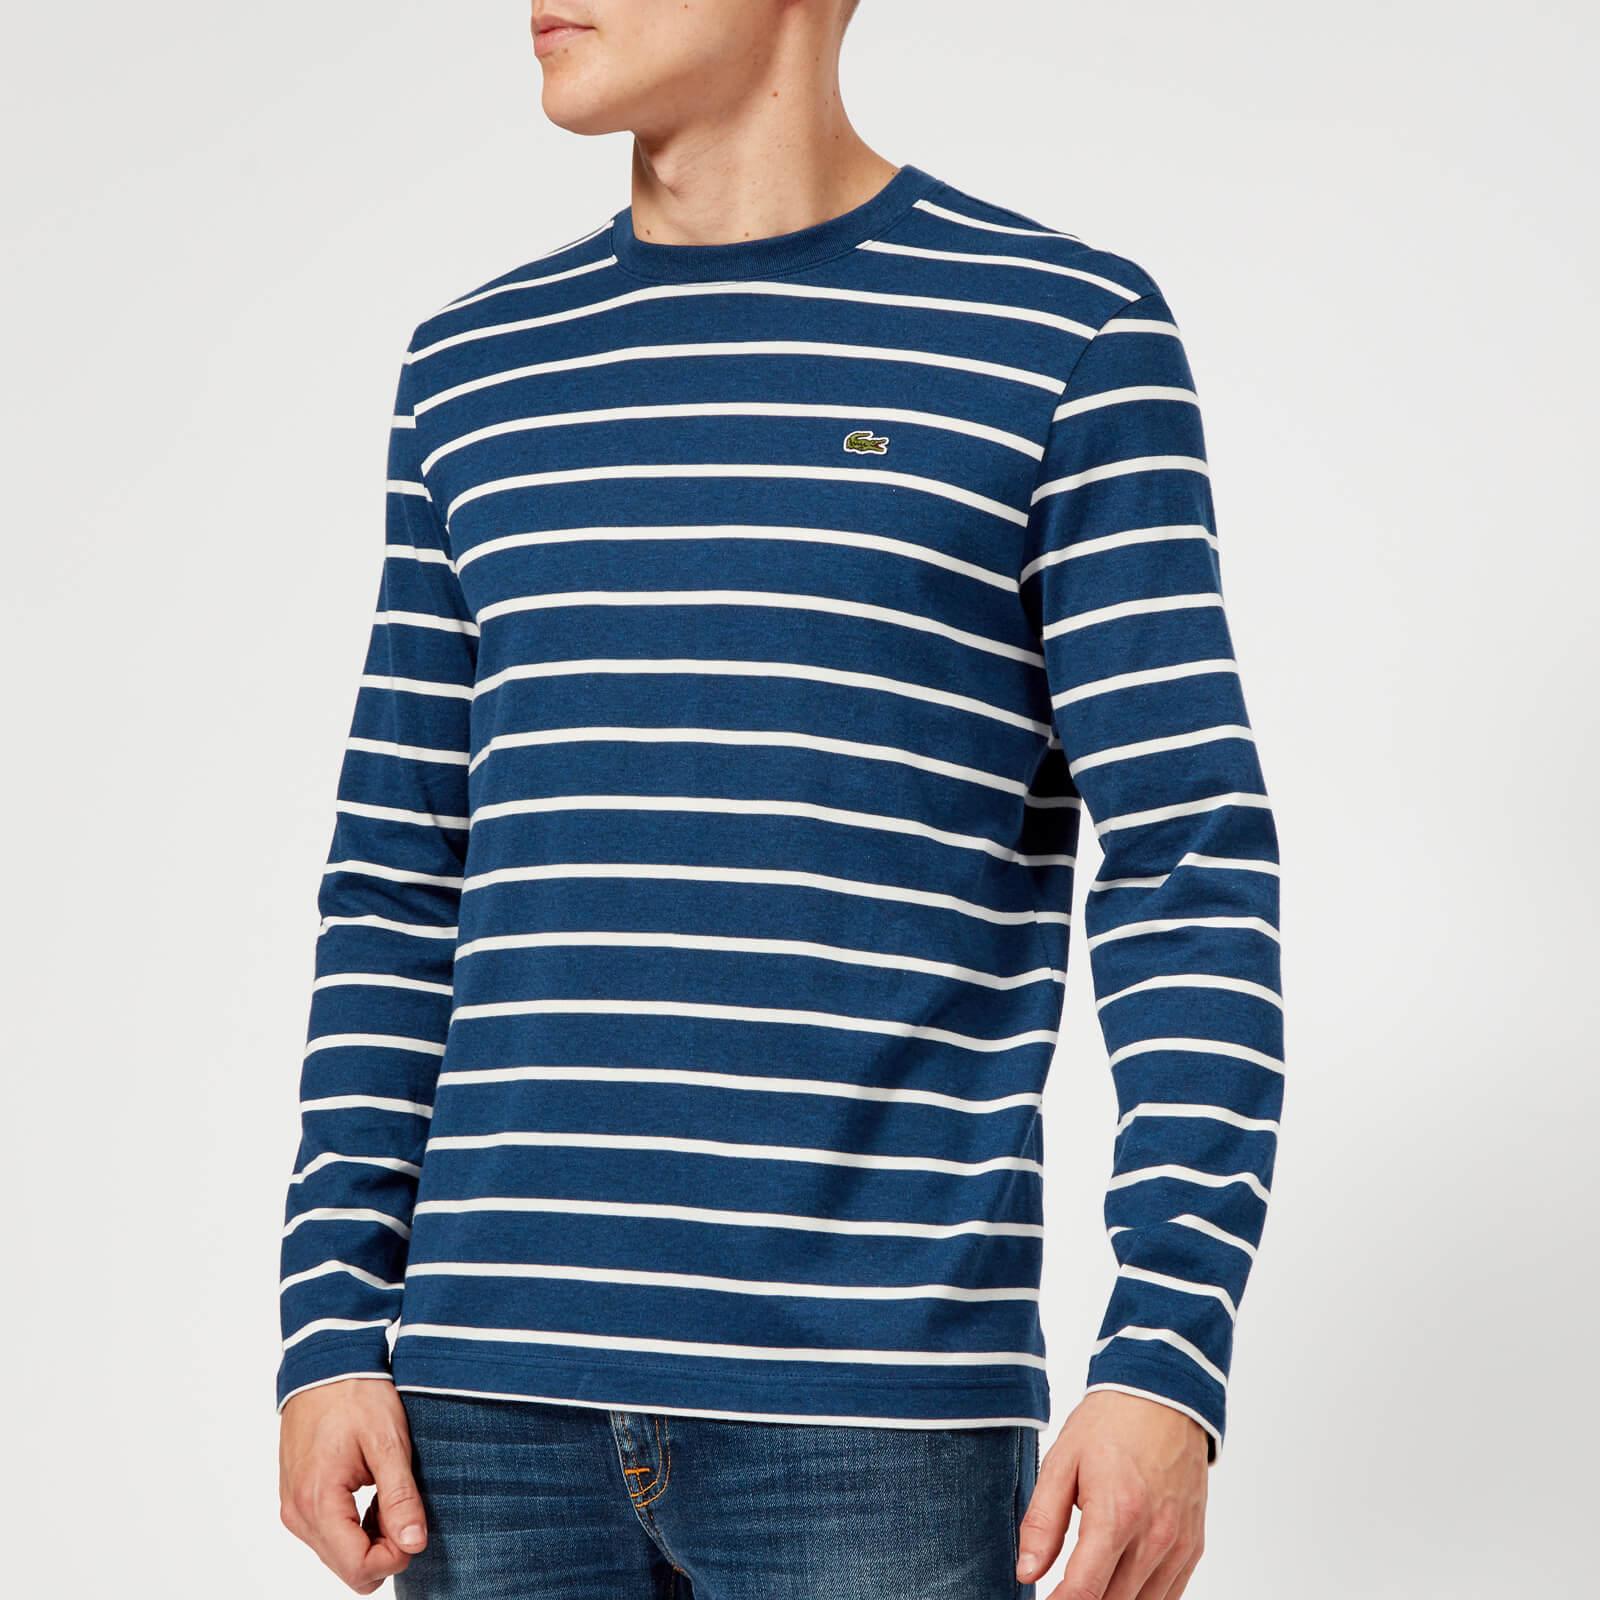 f6f75dca9a8fd Lacoste Men s Long Sleeve Breton Stripe T-Shirt - Matelot Chine Flour -  Free UK Delivery over £50